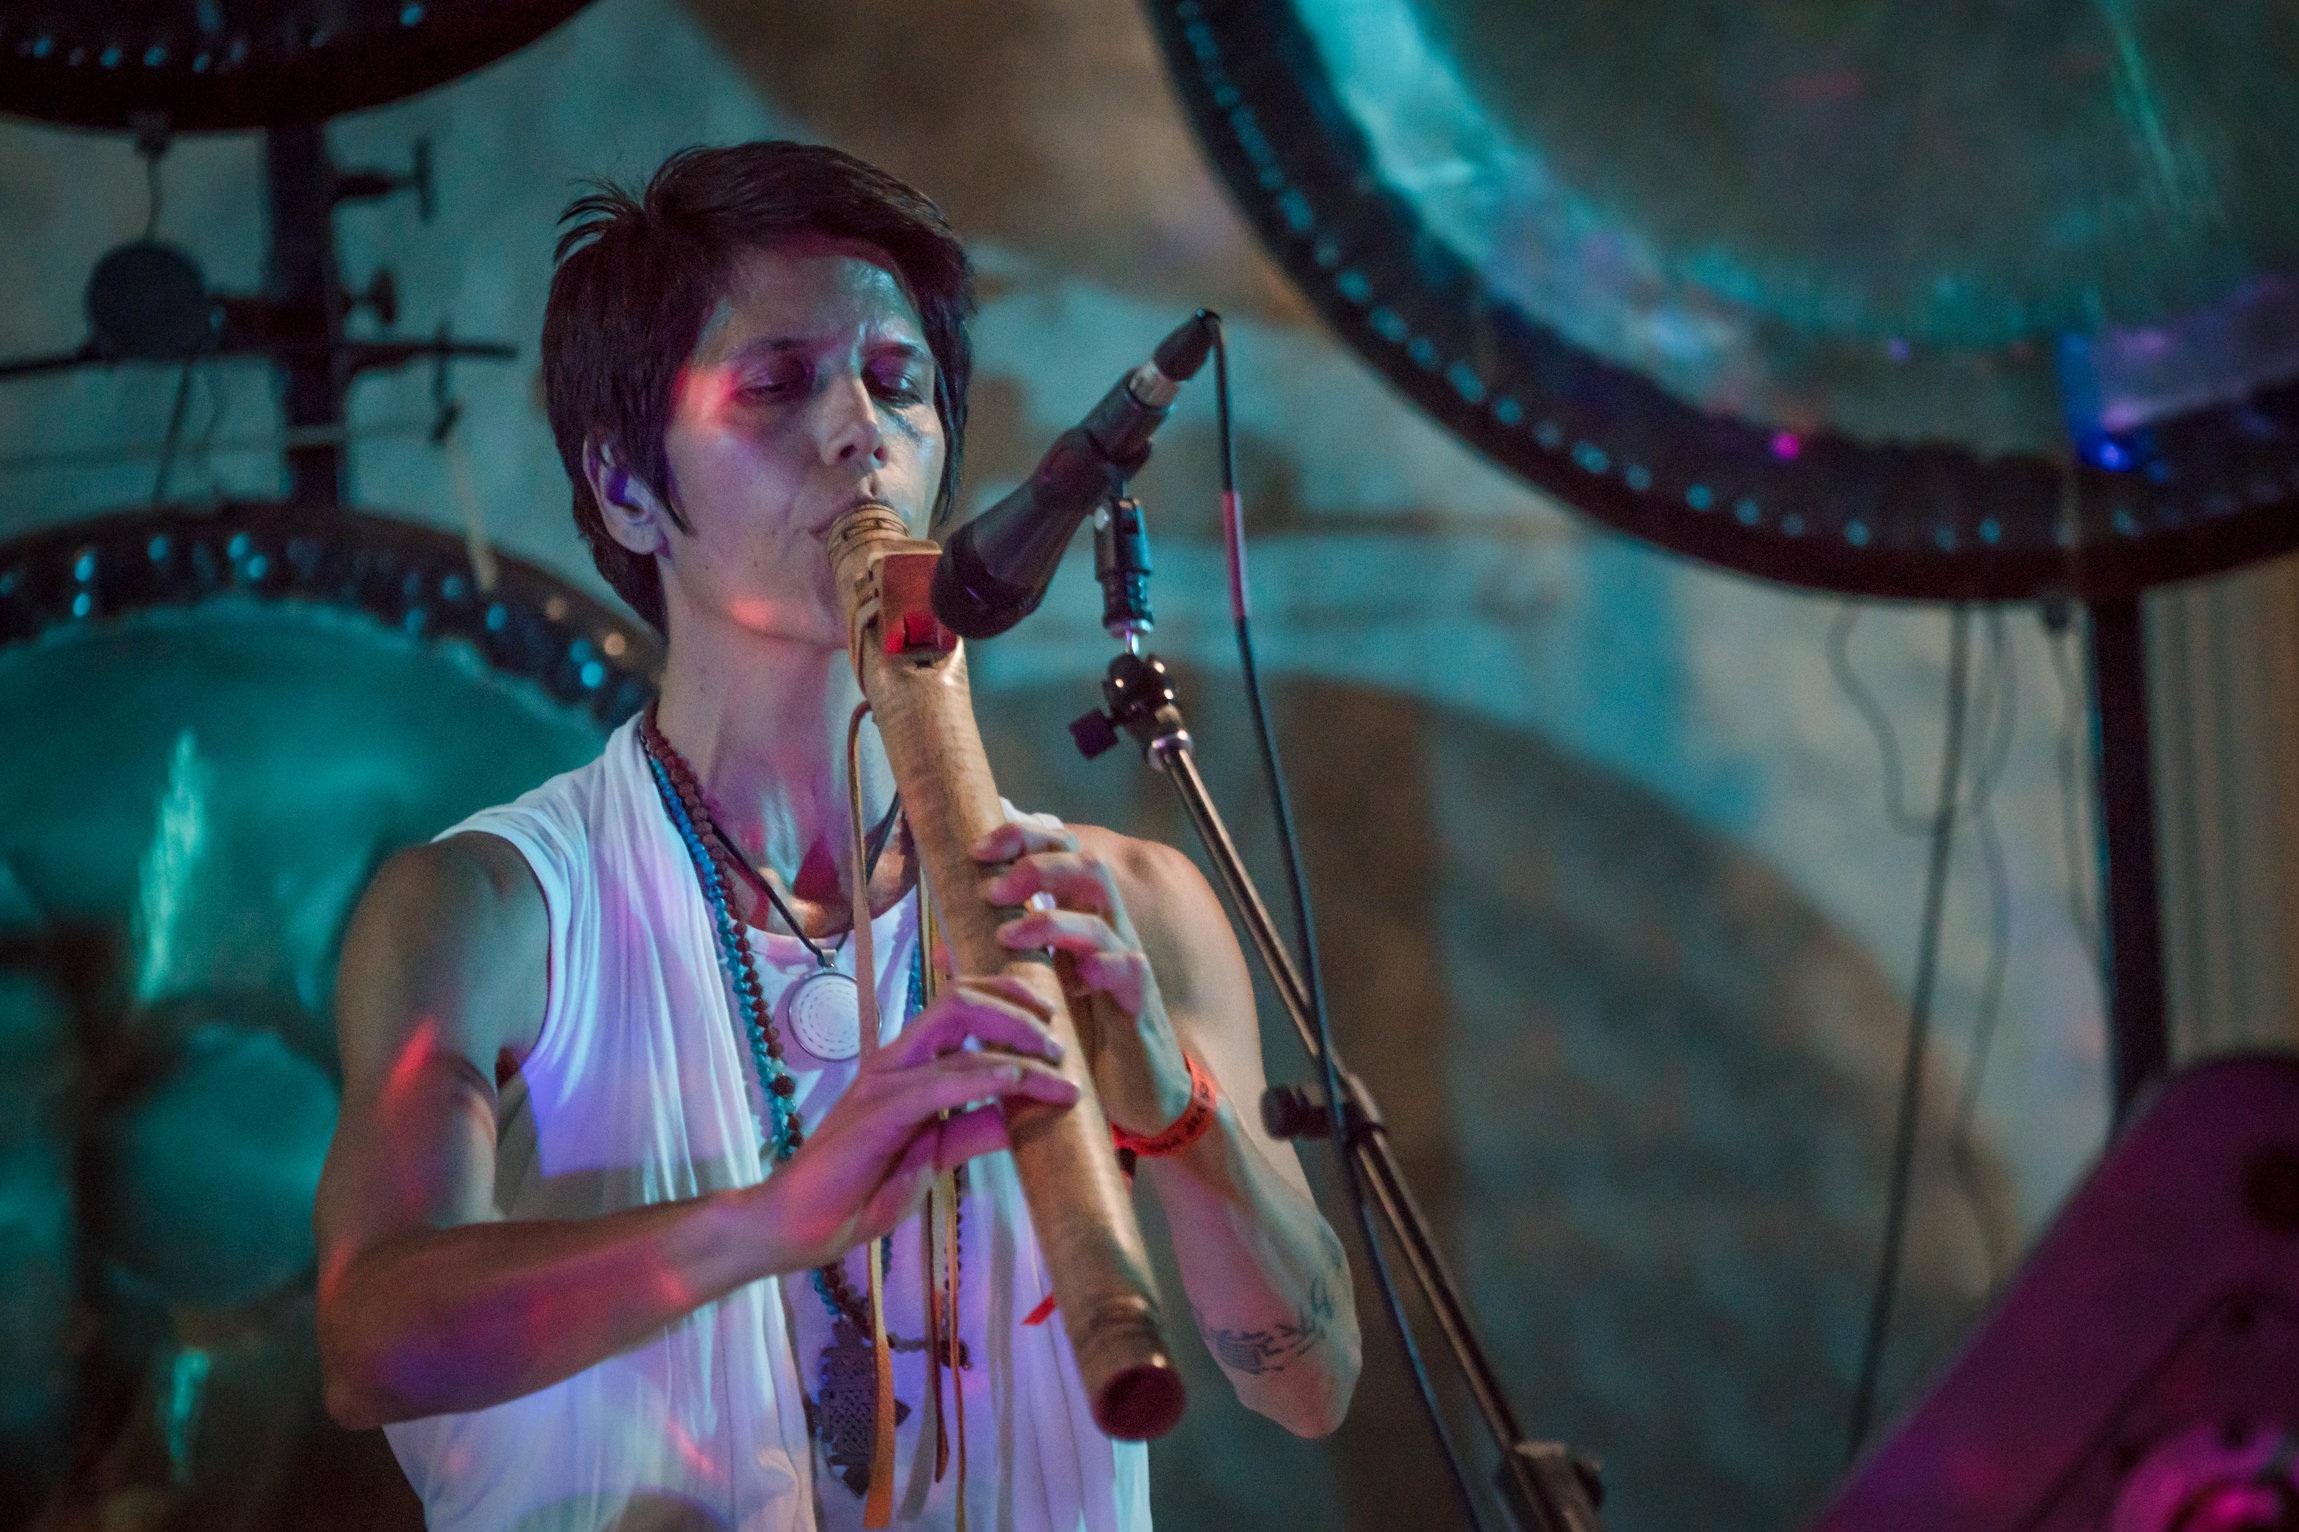 Kerem Brule - Music Meditation Educator, Improvisational Healing Soundscape Artist, Creator of Beautiful Soundsplaybeautifulsounds.com